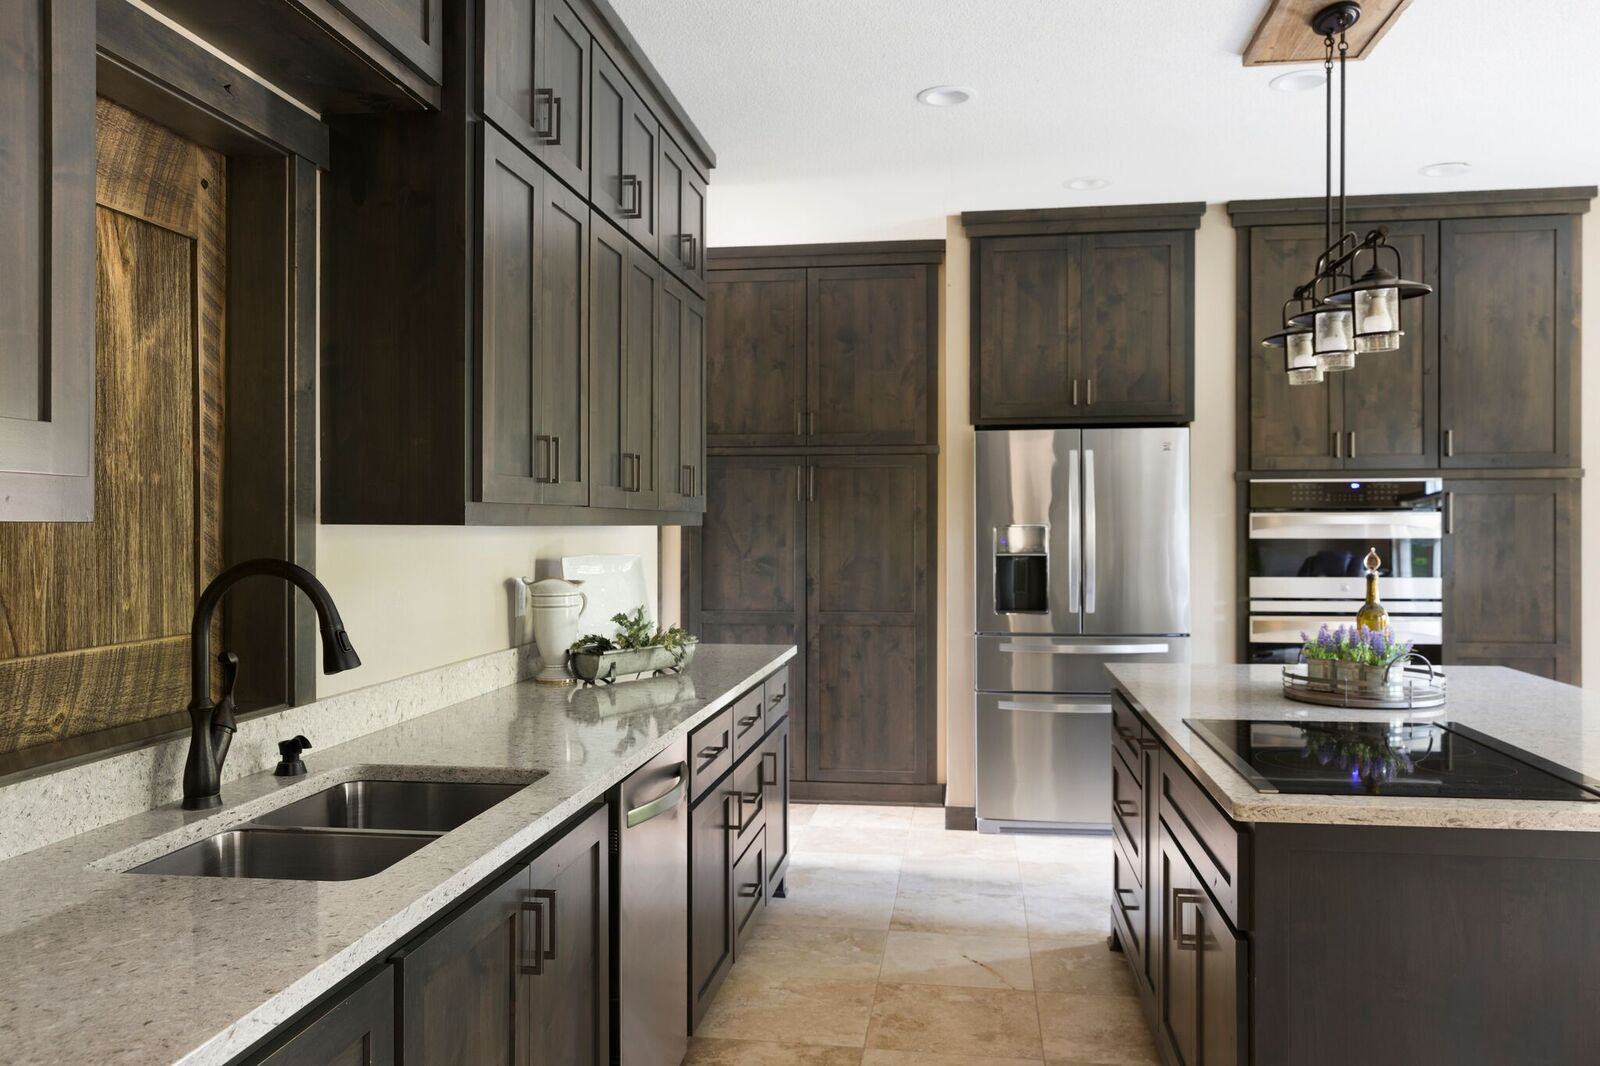 Moms Design Build - Modern Farmhouse Kitchen Counter Top